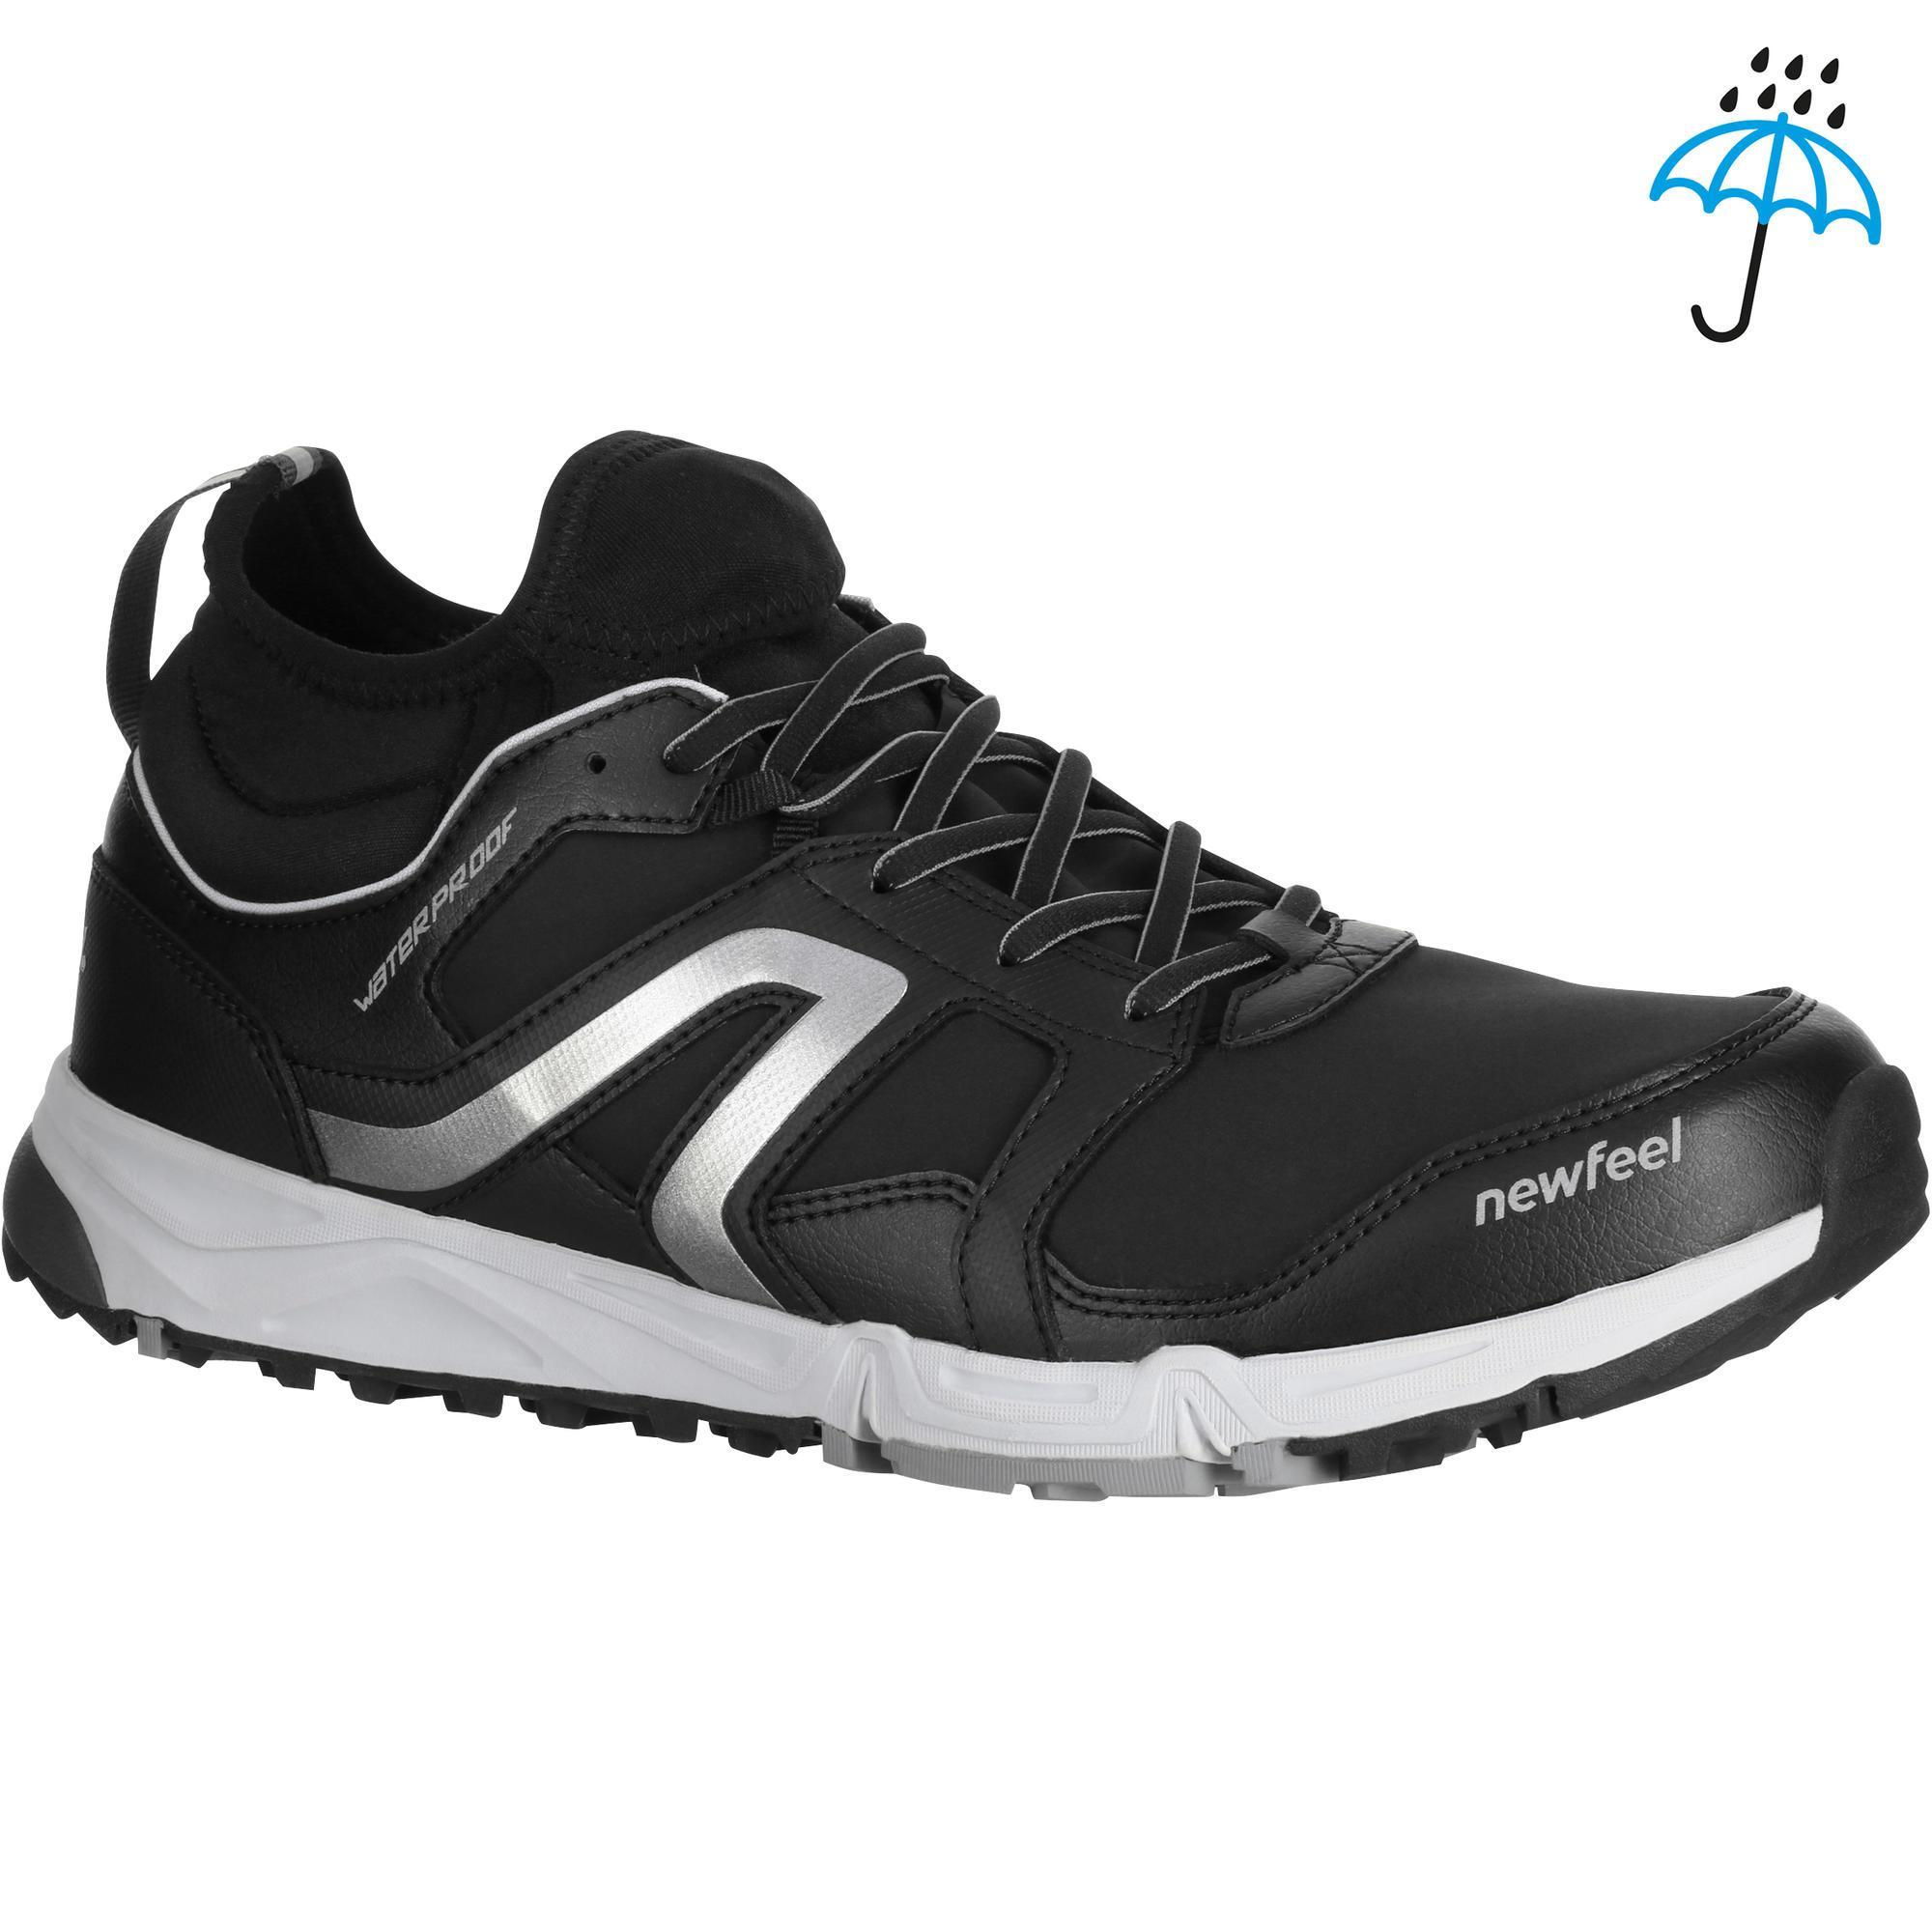 Chaussures de marche nordique homme NW 580 Flex-H Waterproof noir - Newfeel